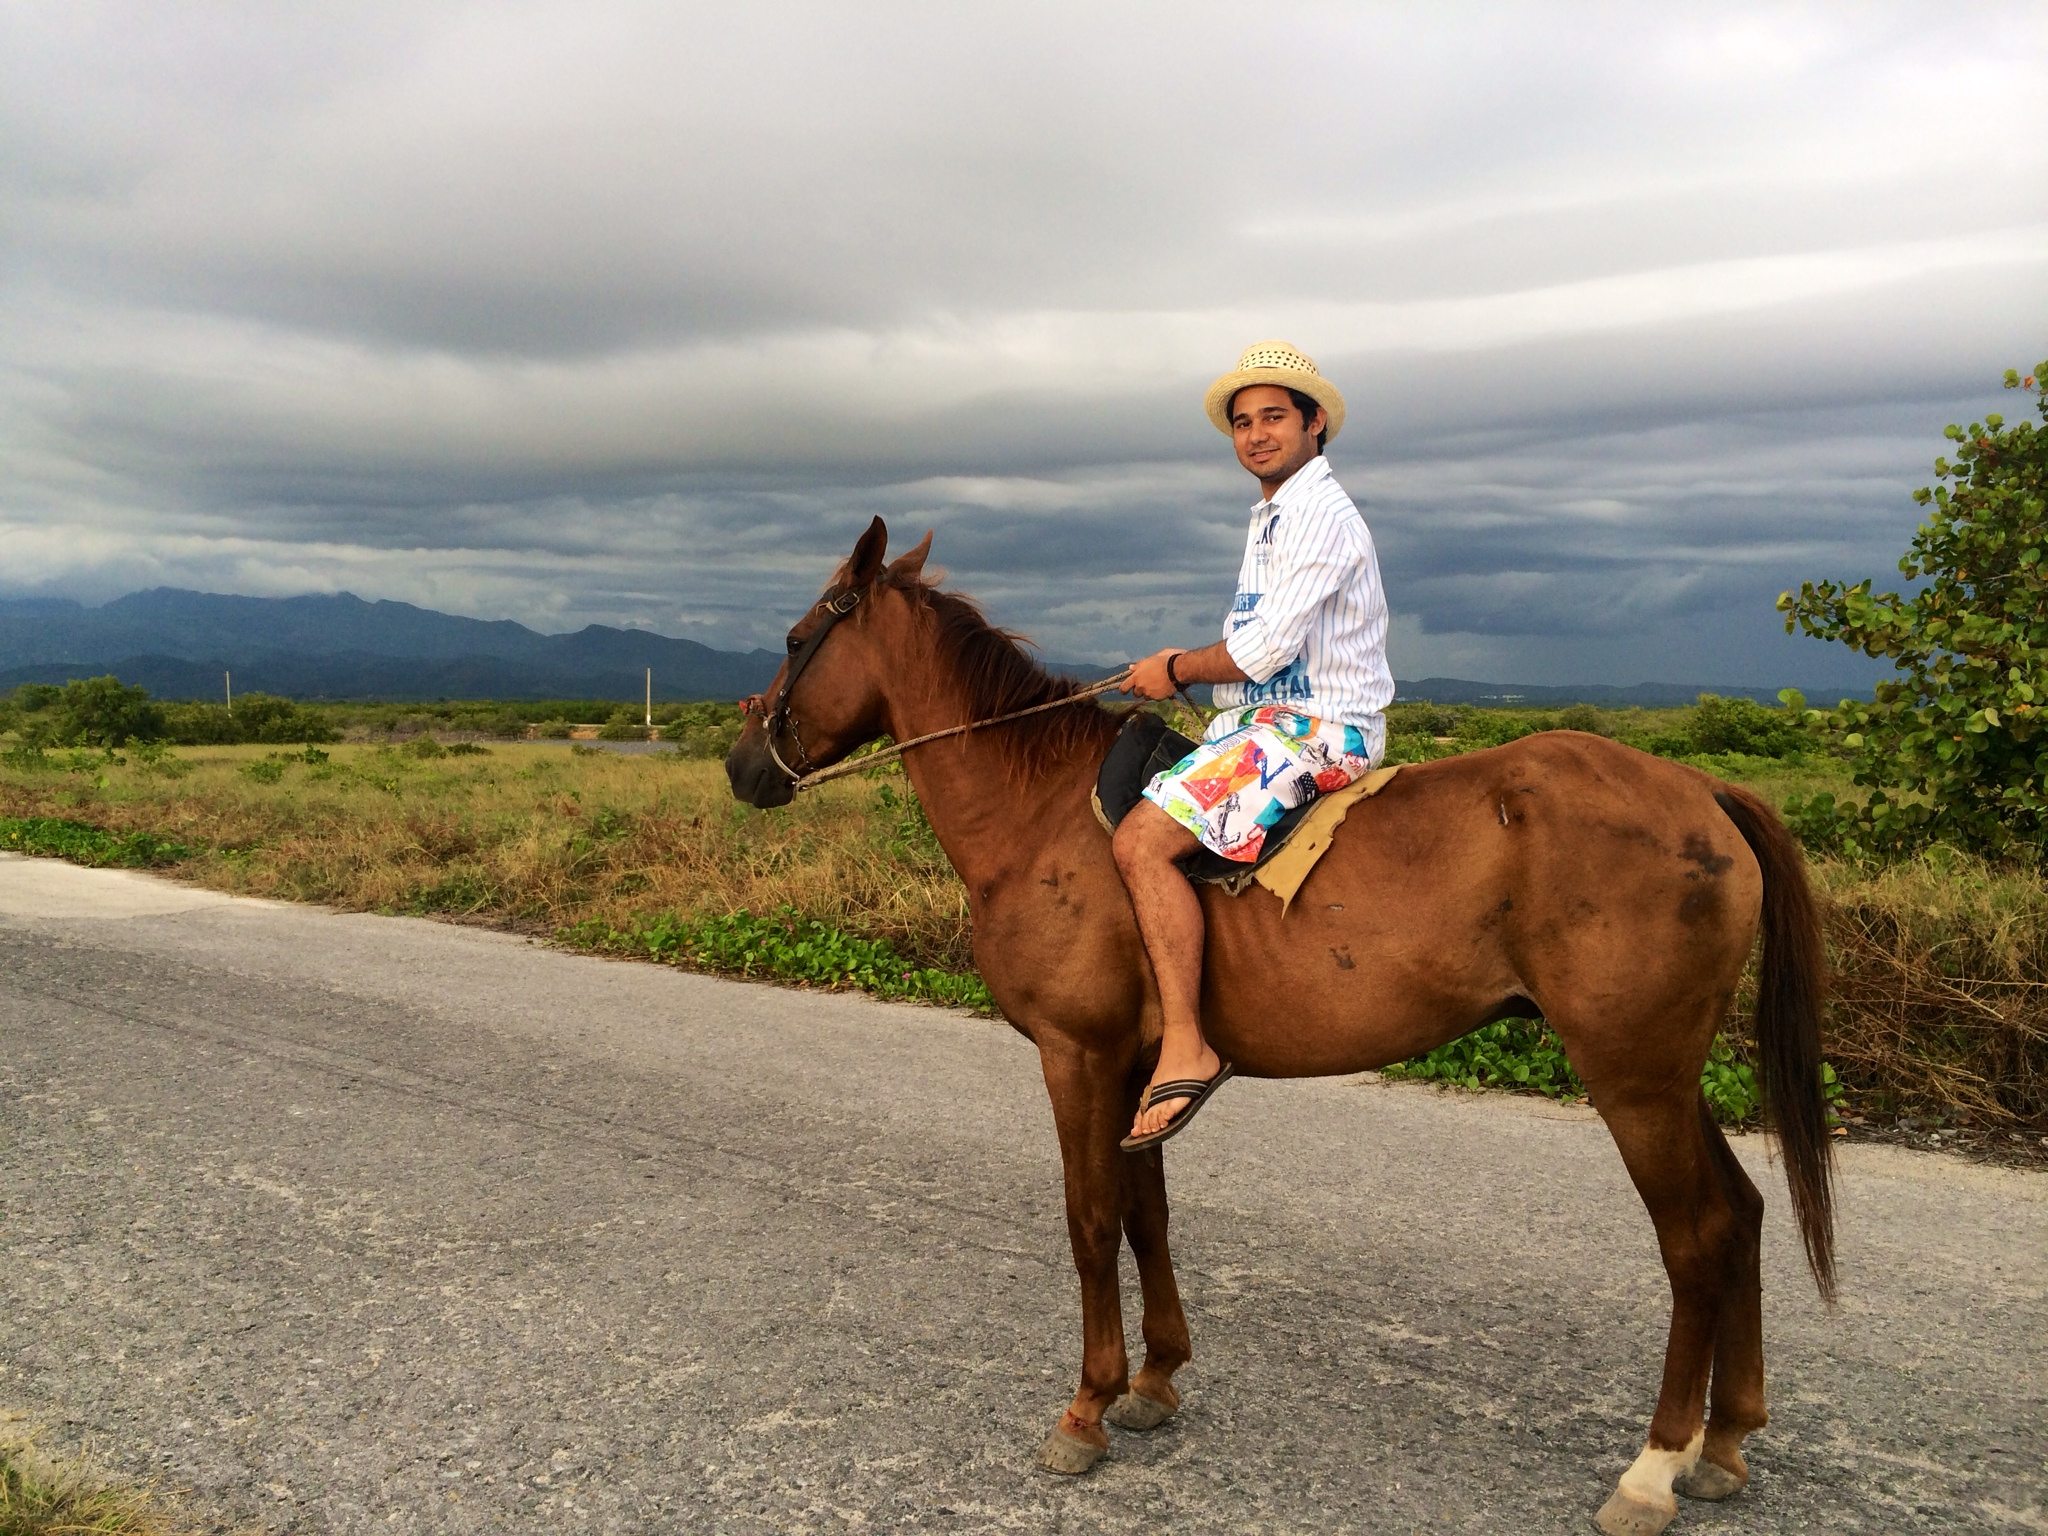 Karim on a horse in Cuba